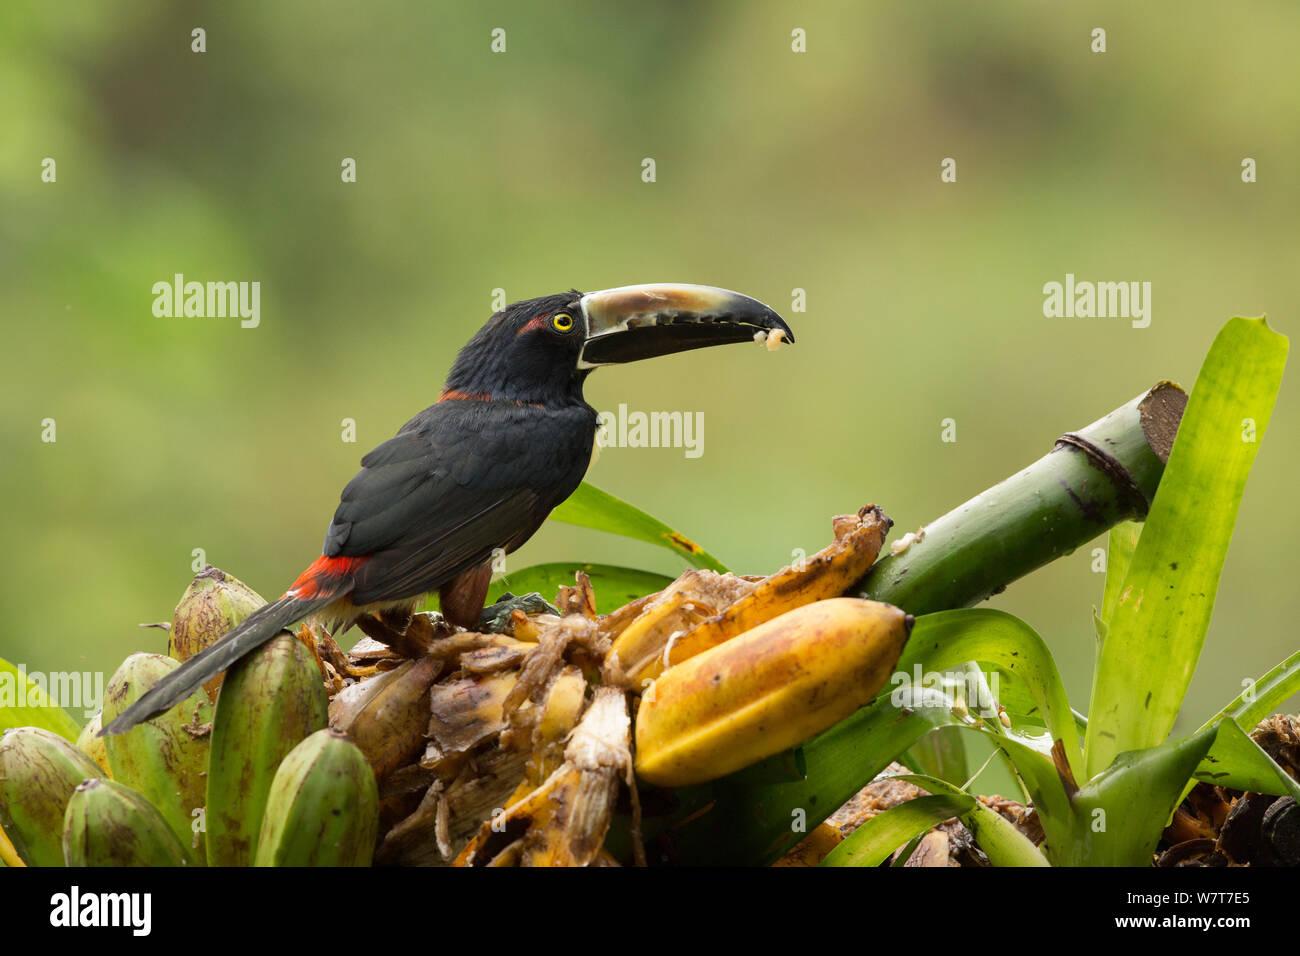 Collared Aracari (Pteroglossus torquatus) feeding on wild banana (Musa), Costa Rica Stock Photo